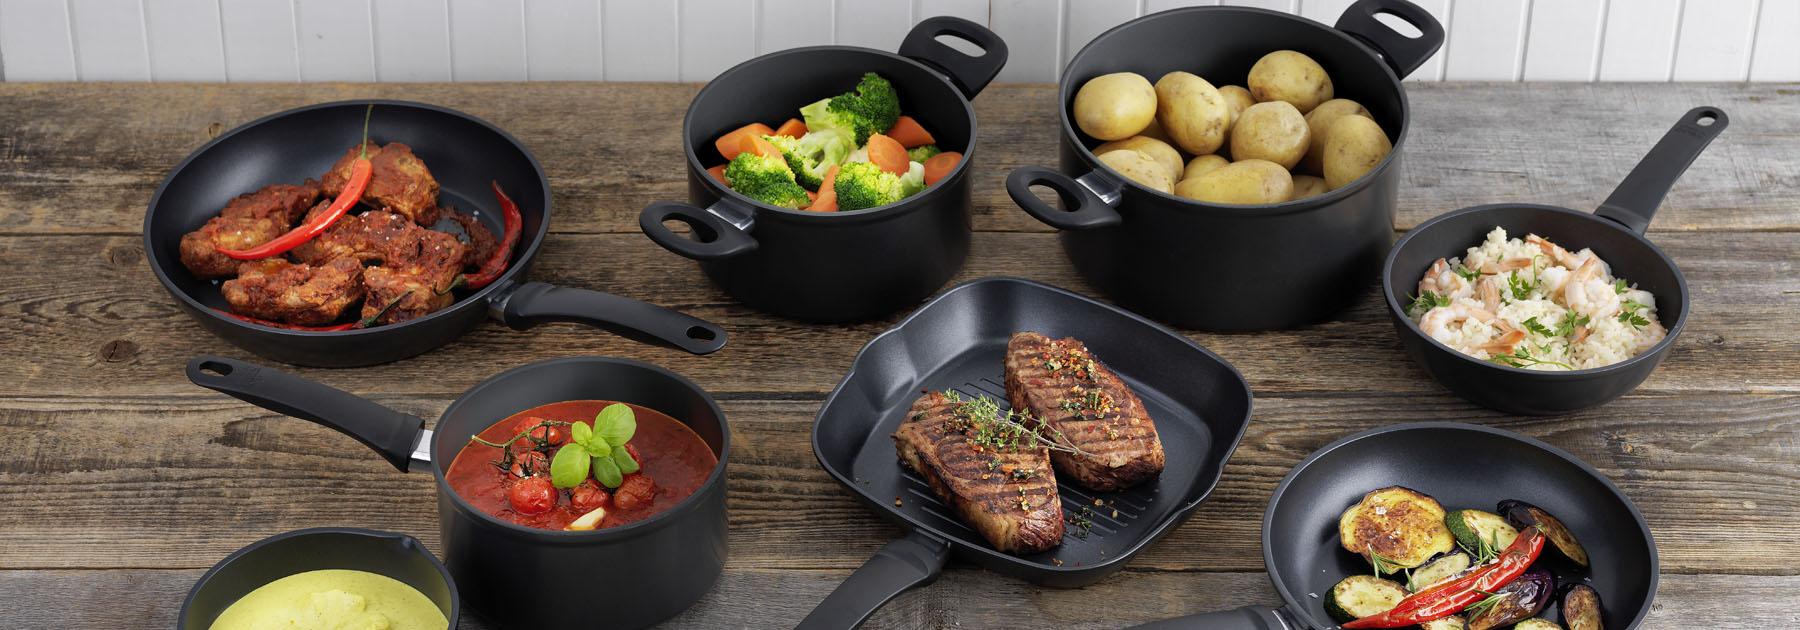 non, stick, saucepans, frying, pans, casseroles, grill, induction, discount, sale, offer